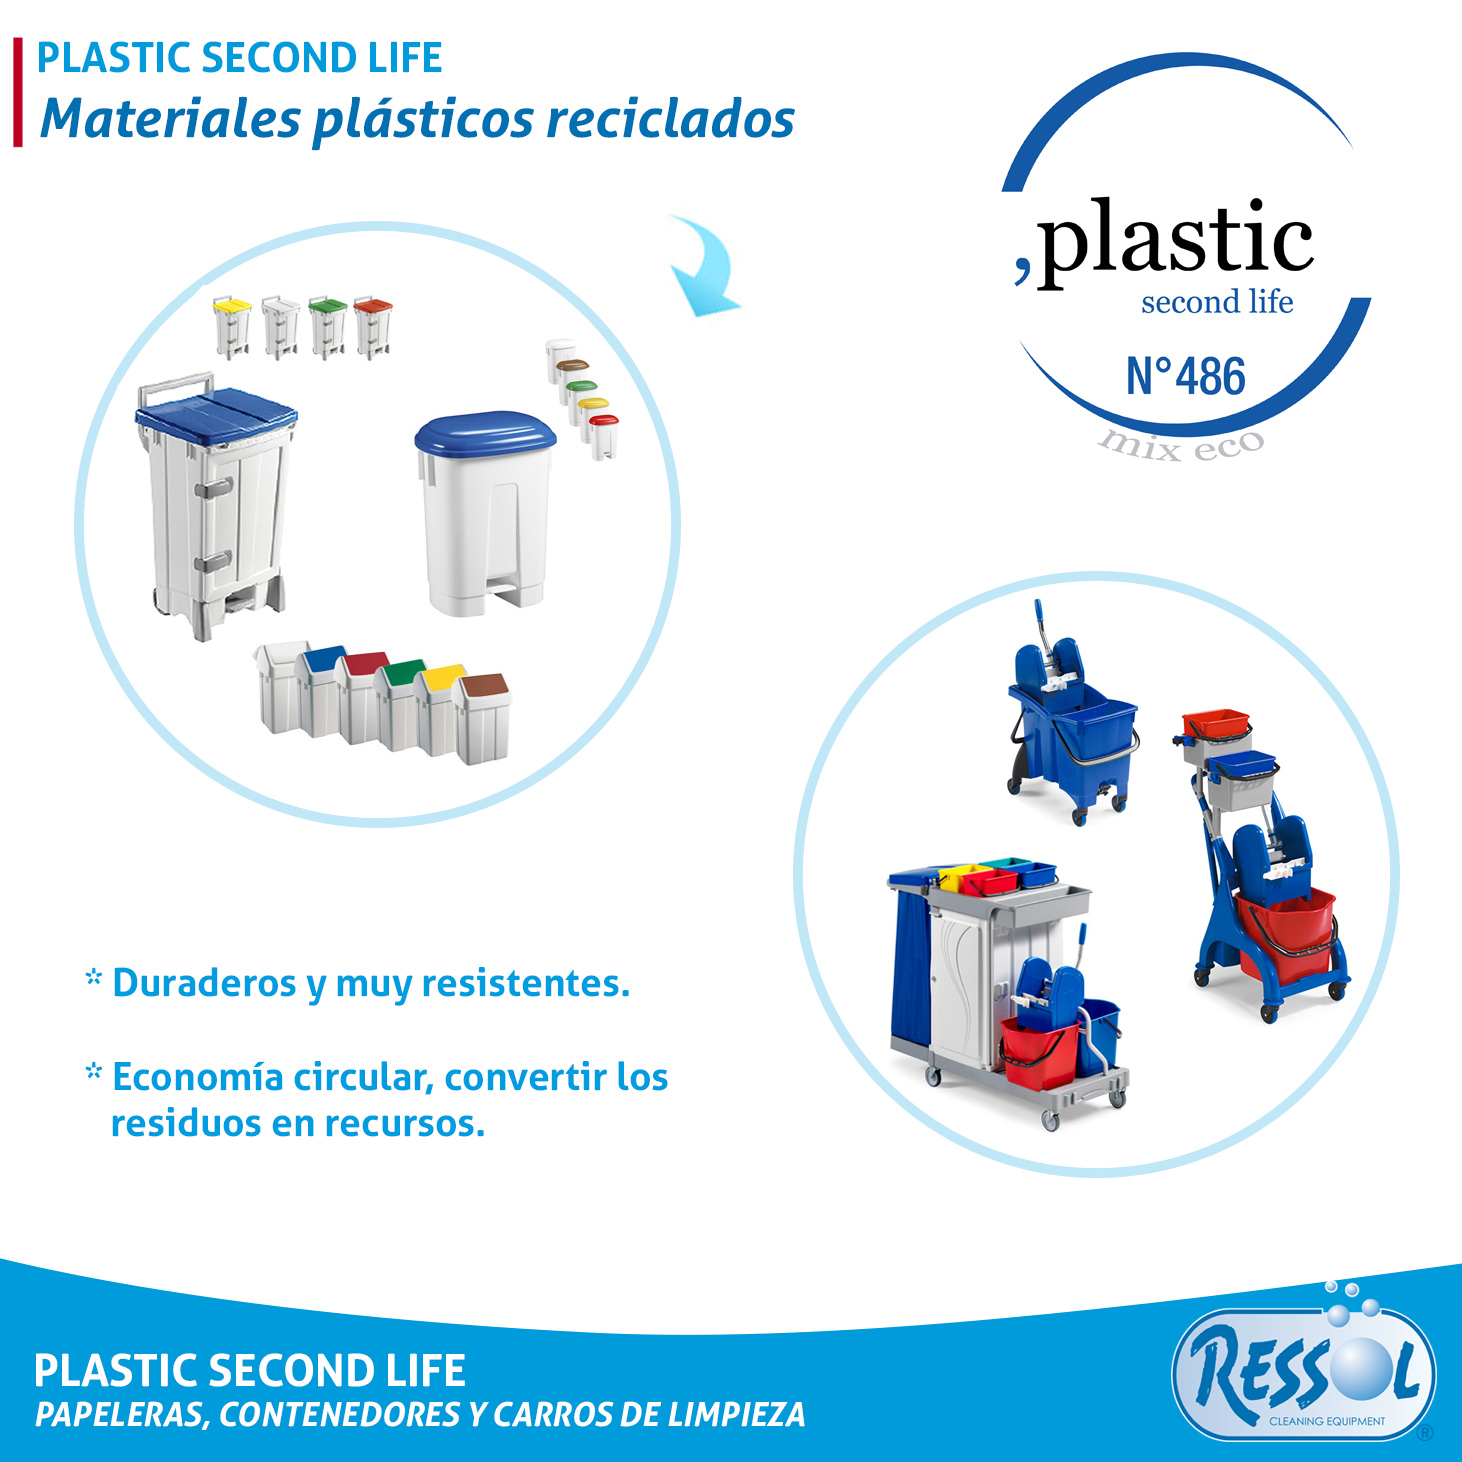 PLASTIC SECOND LIFE